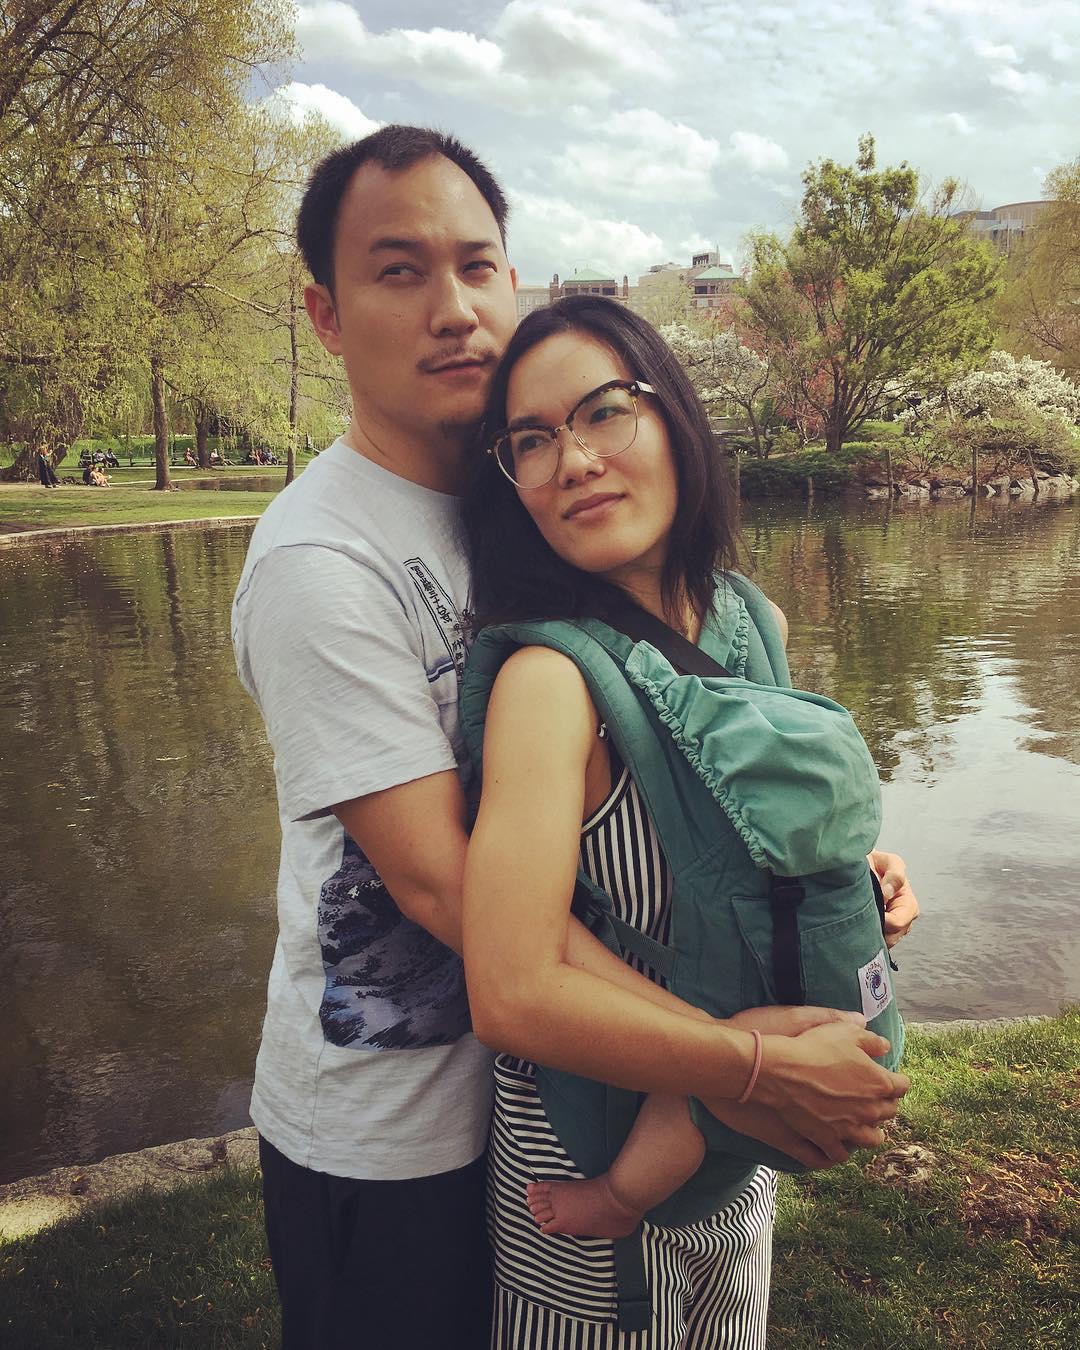 Justin Hakuta and Ali Wong posing by the riverside